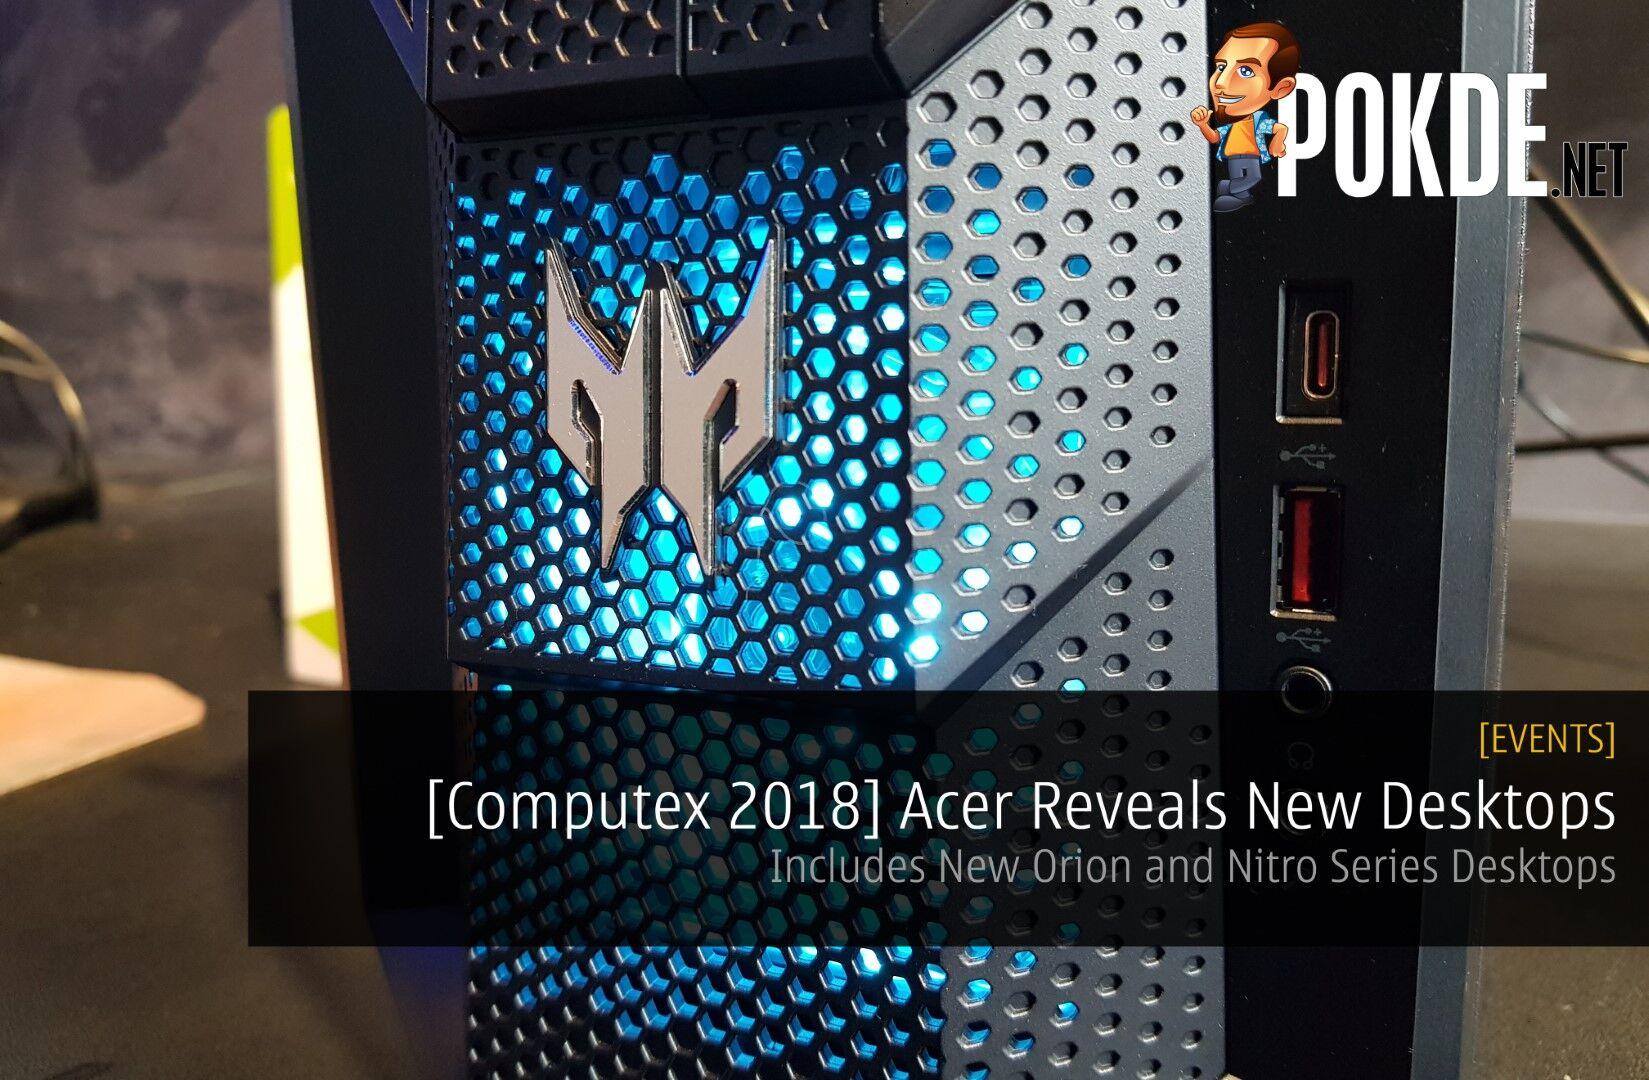 [Computex 2018] Acer Reveals New Desktops - Includes New Orion and Nitro Series Desktops 30